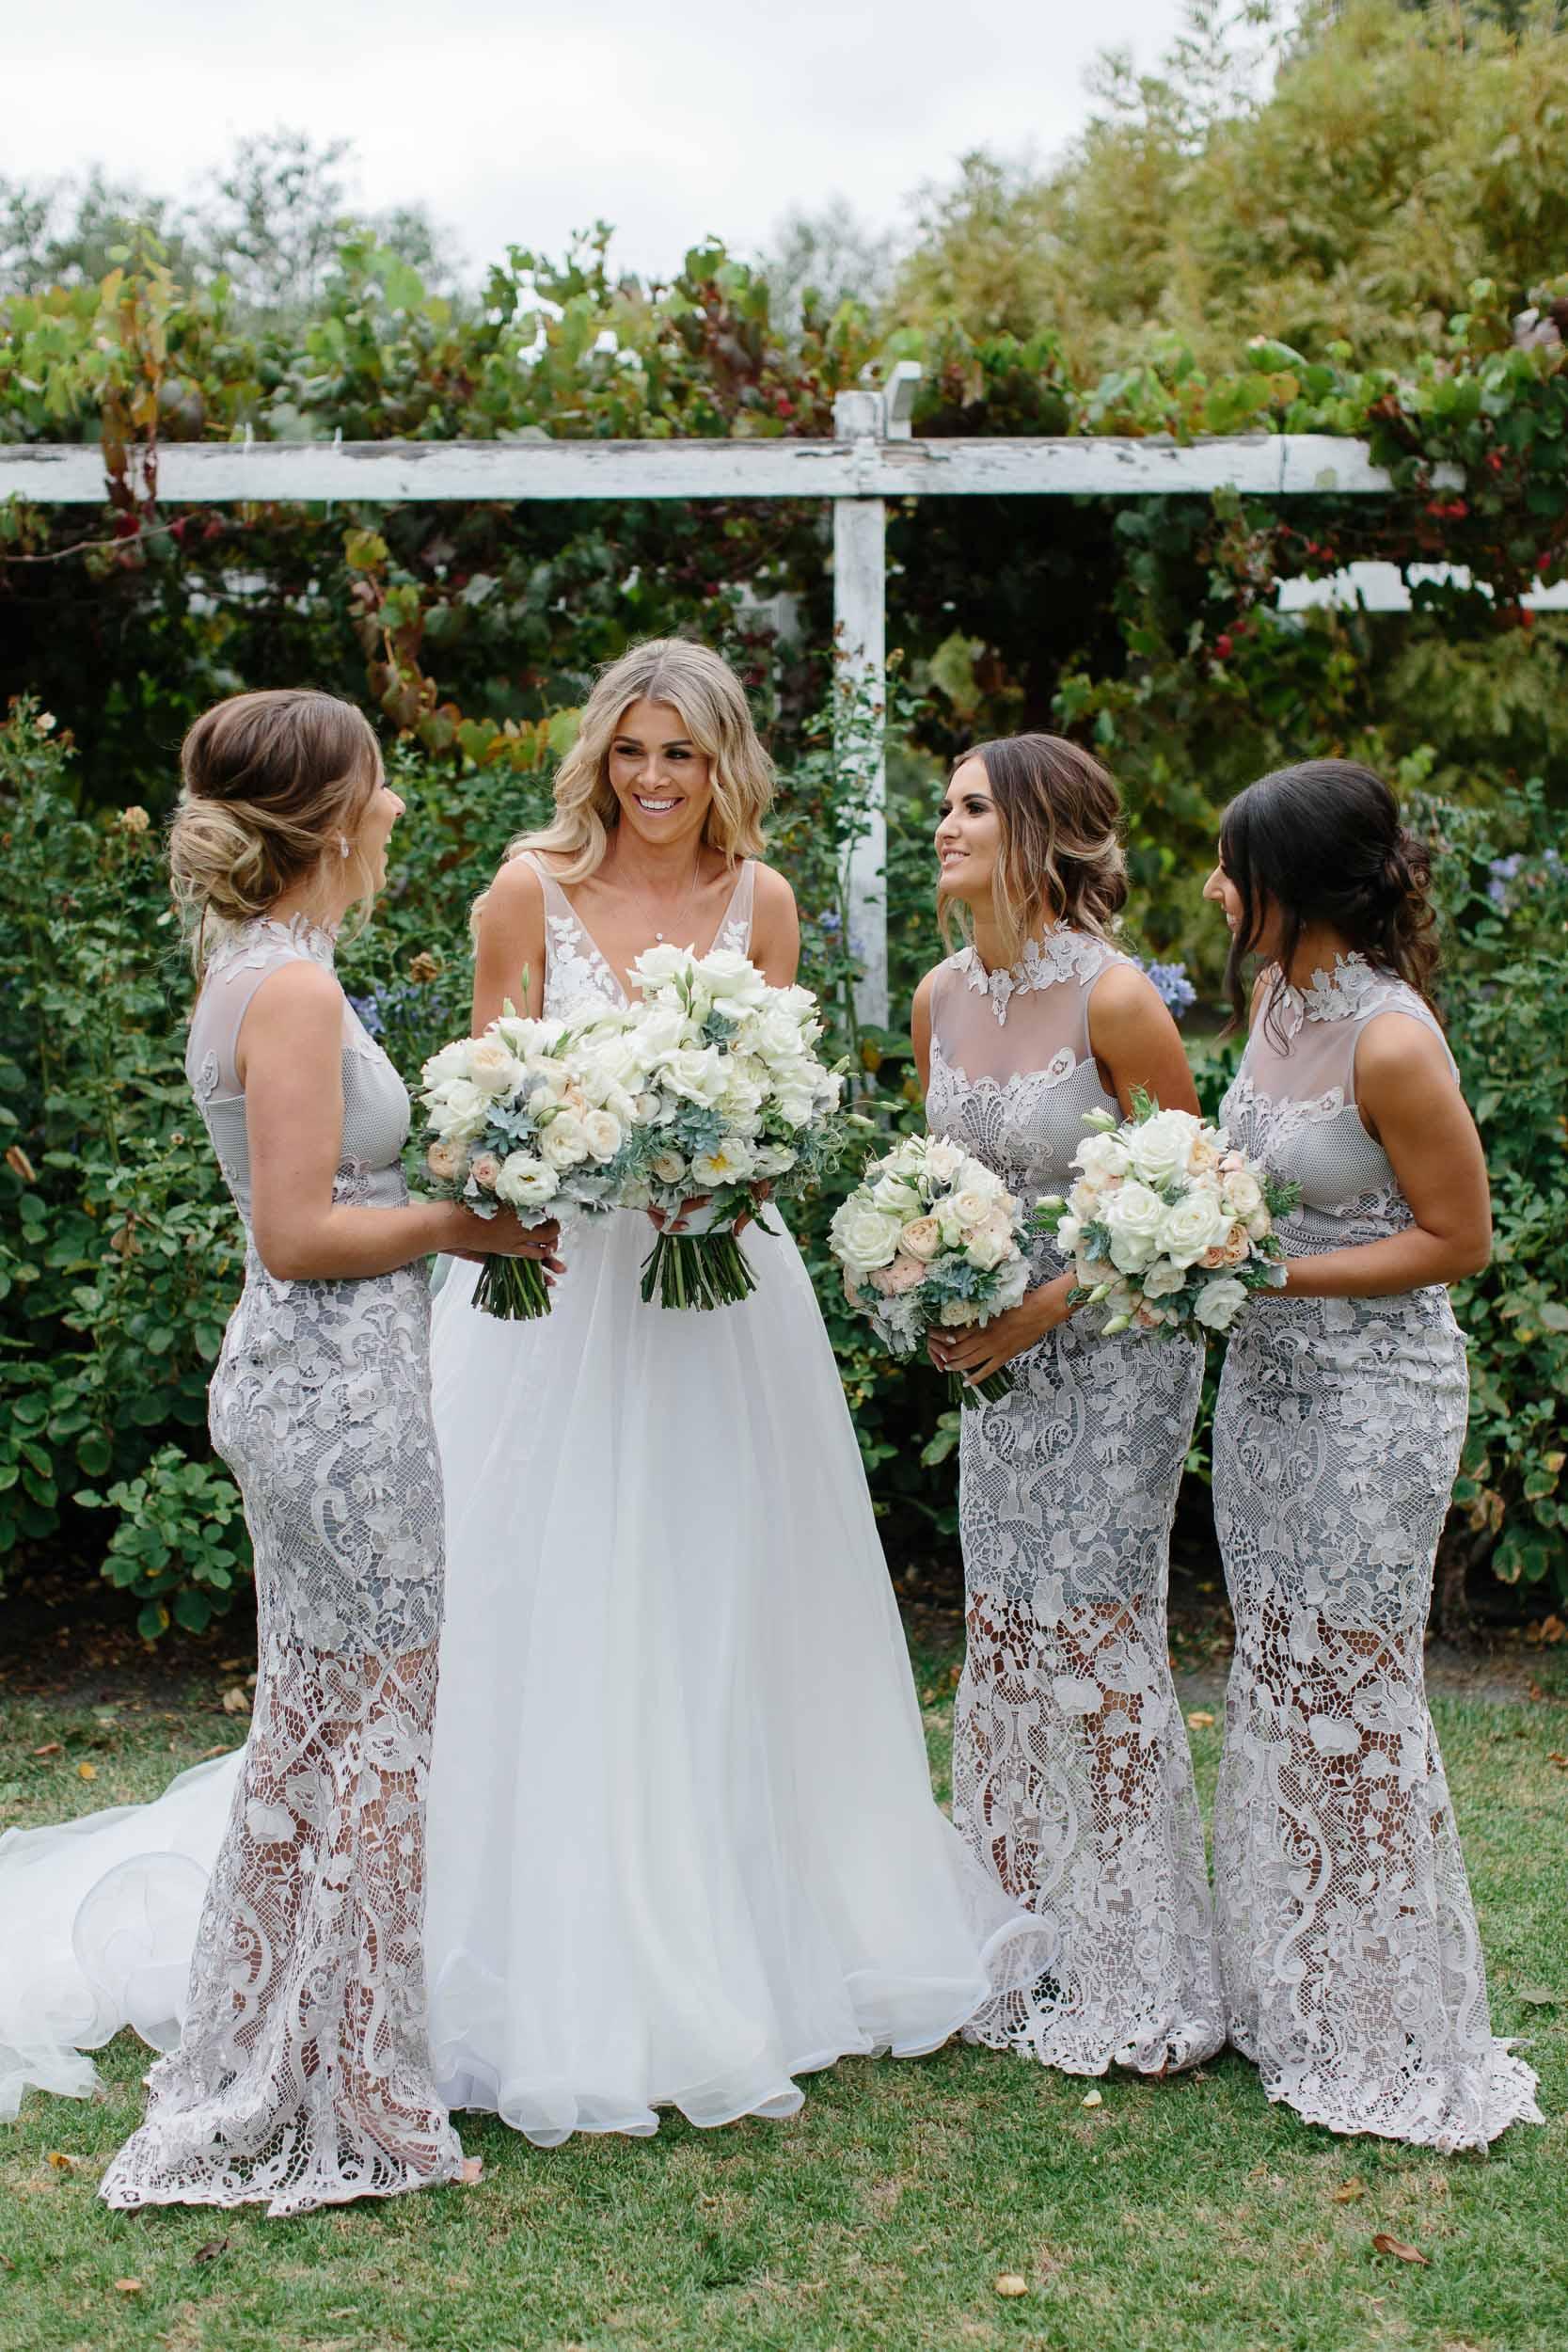 Kas-Richards-Mornington-Peninsula-Private-Property-Wedding-Marianna-Hardwick-Gown-413.jpg